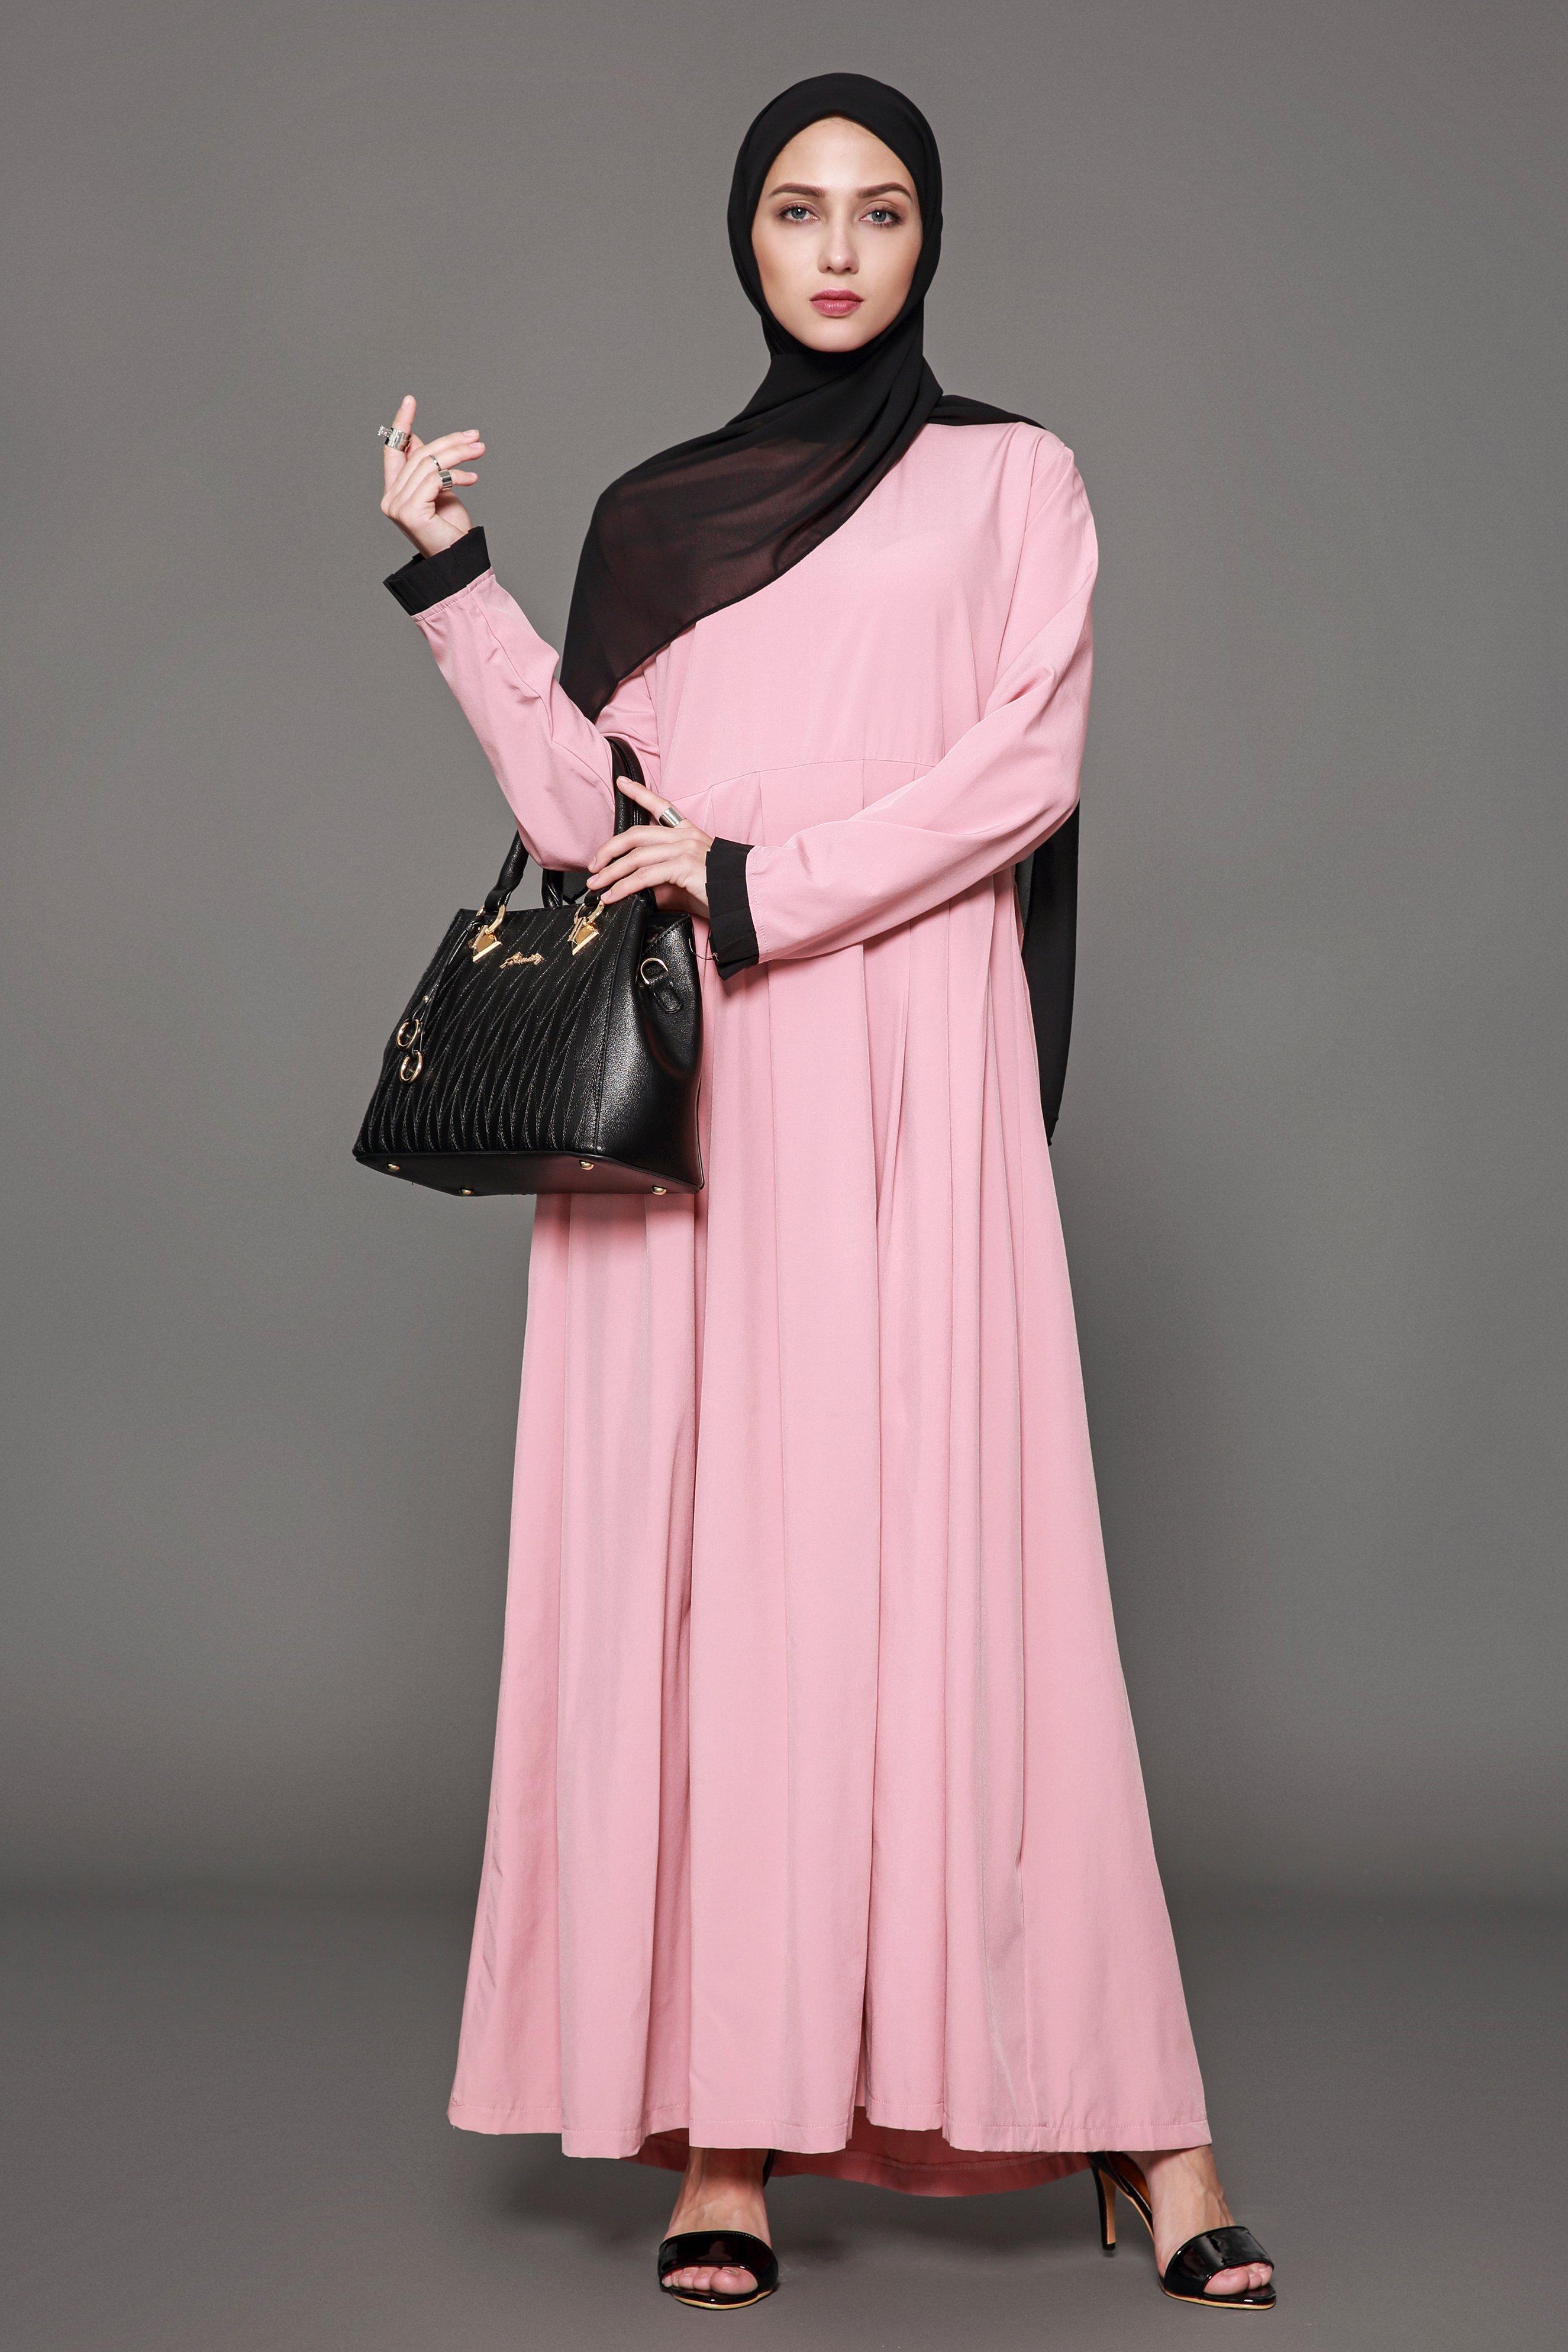 cf5331443d1f Dubai · Islam · Clothing · How To Wear · Try latest Chicloth Muslim W....  http   chicloth.com